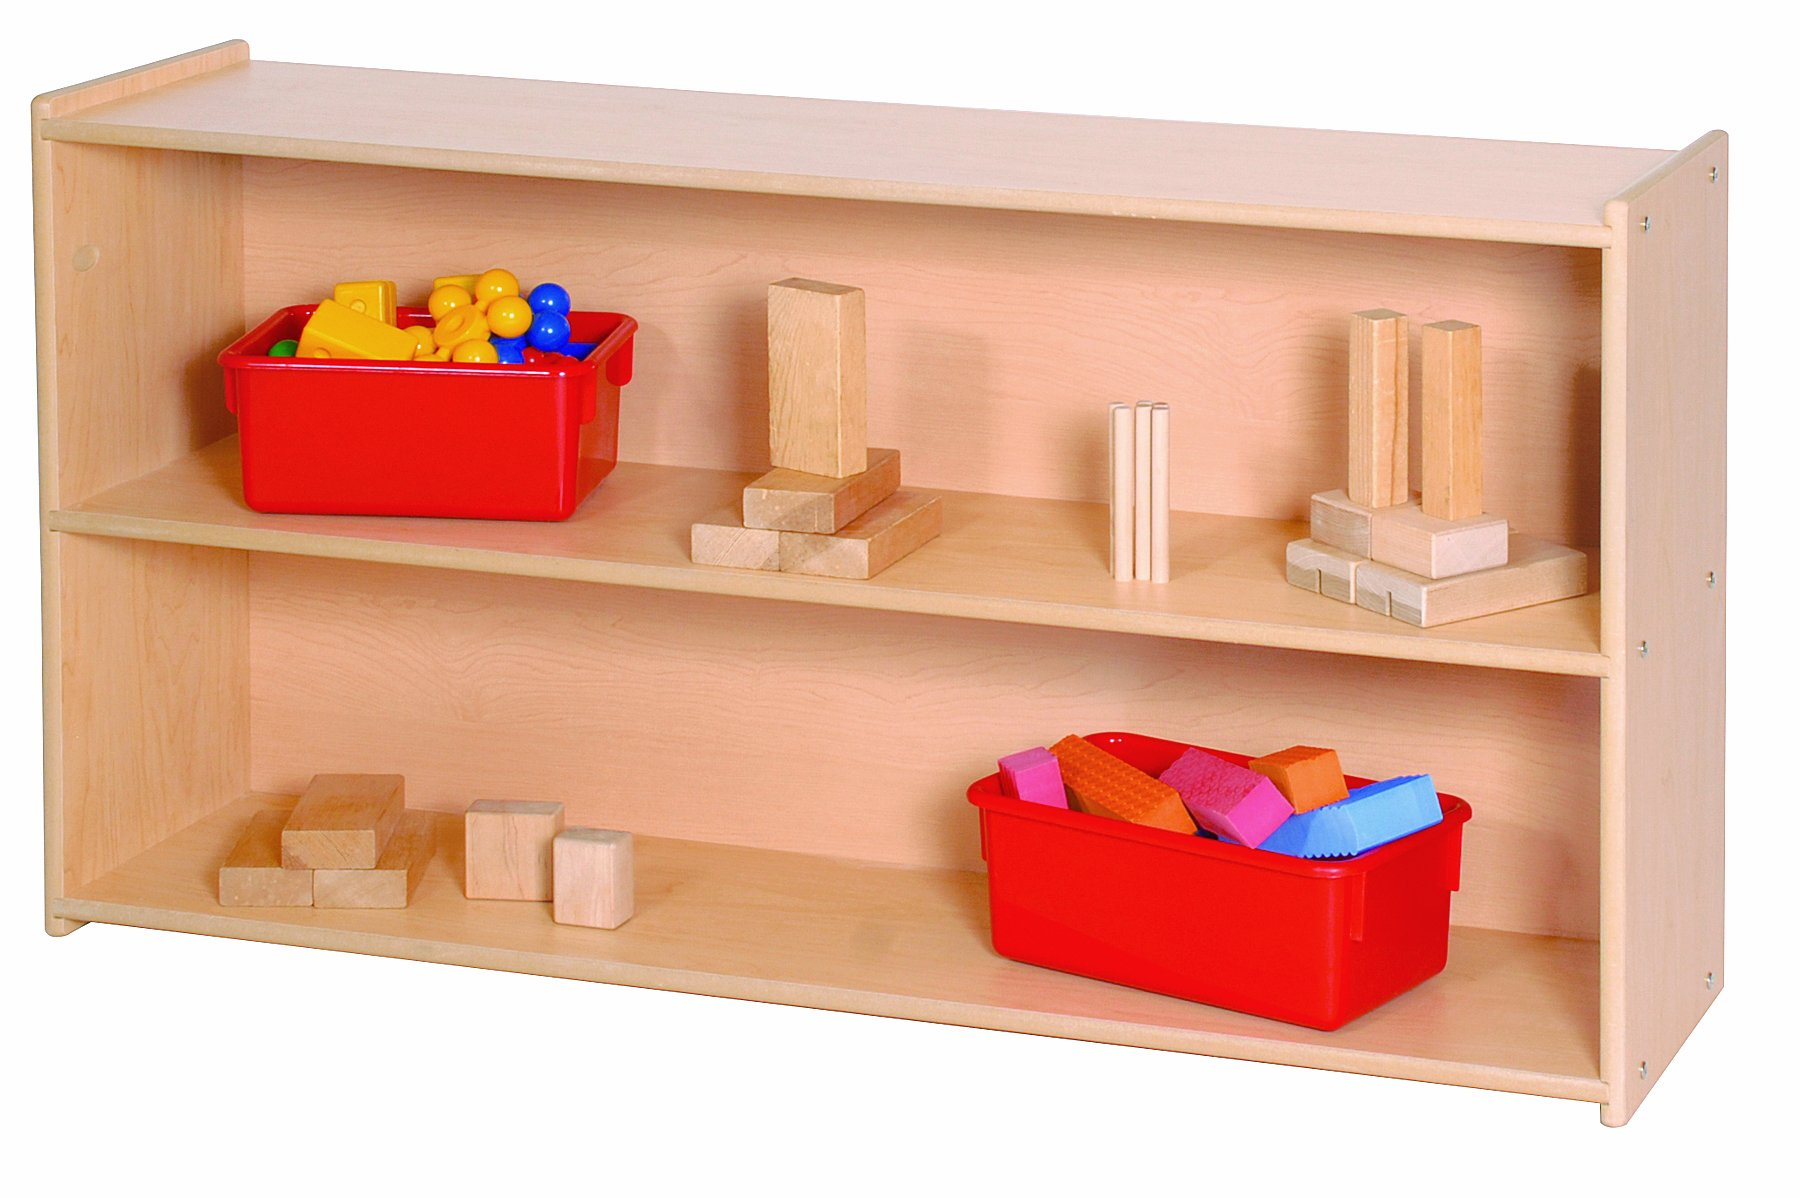 Steffy Wood Products 27-Inch High 2-Shelf Storage